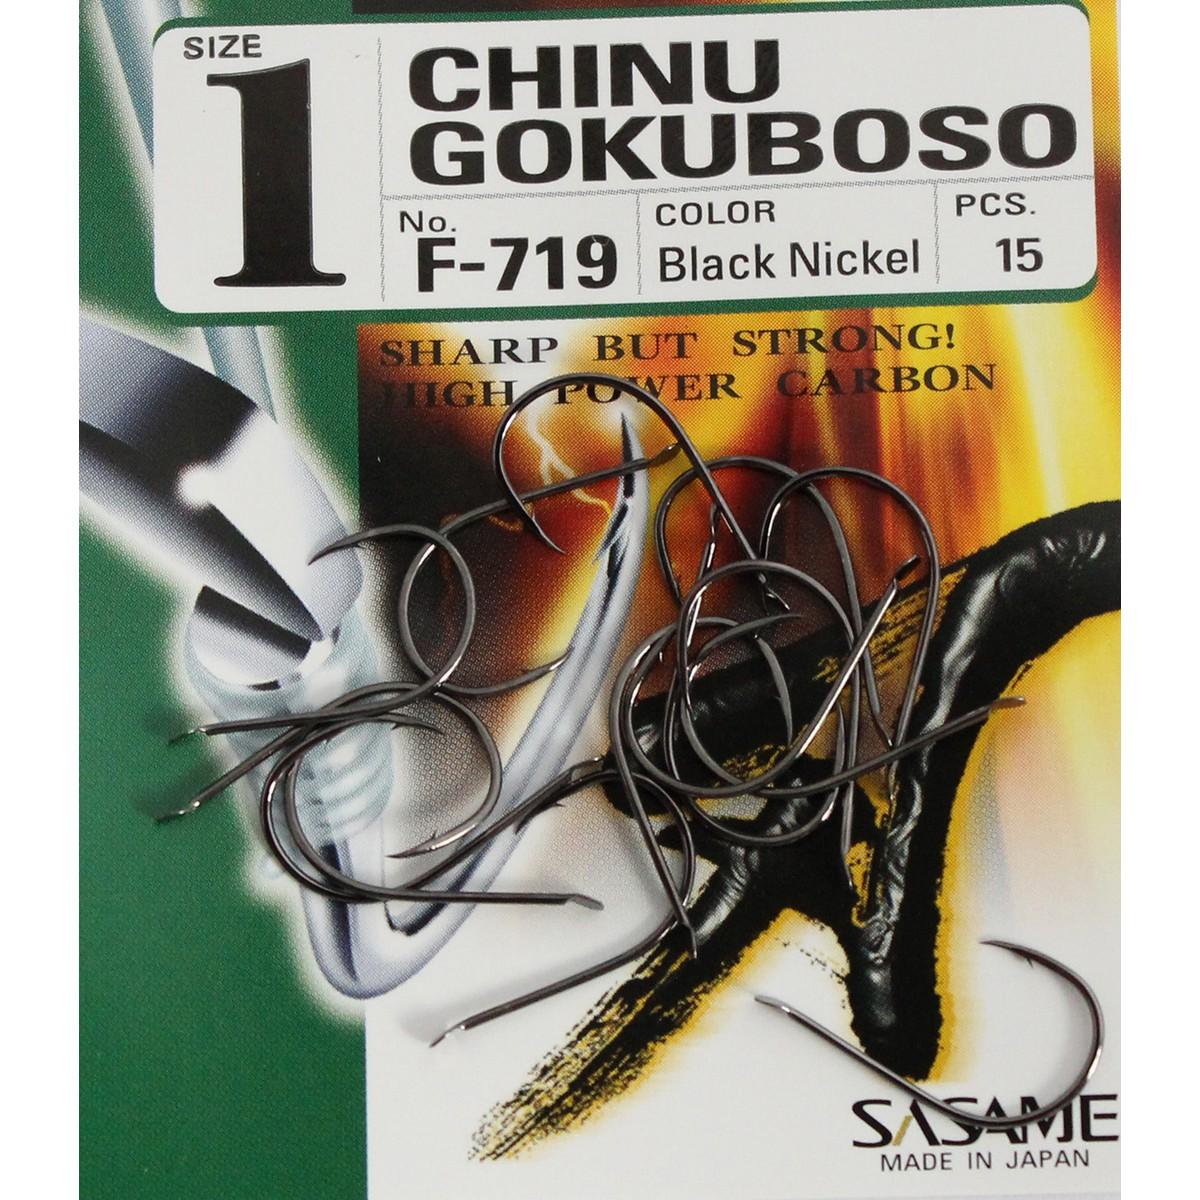 Sasame Chinu Gokuboso F-719